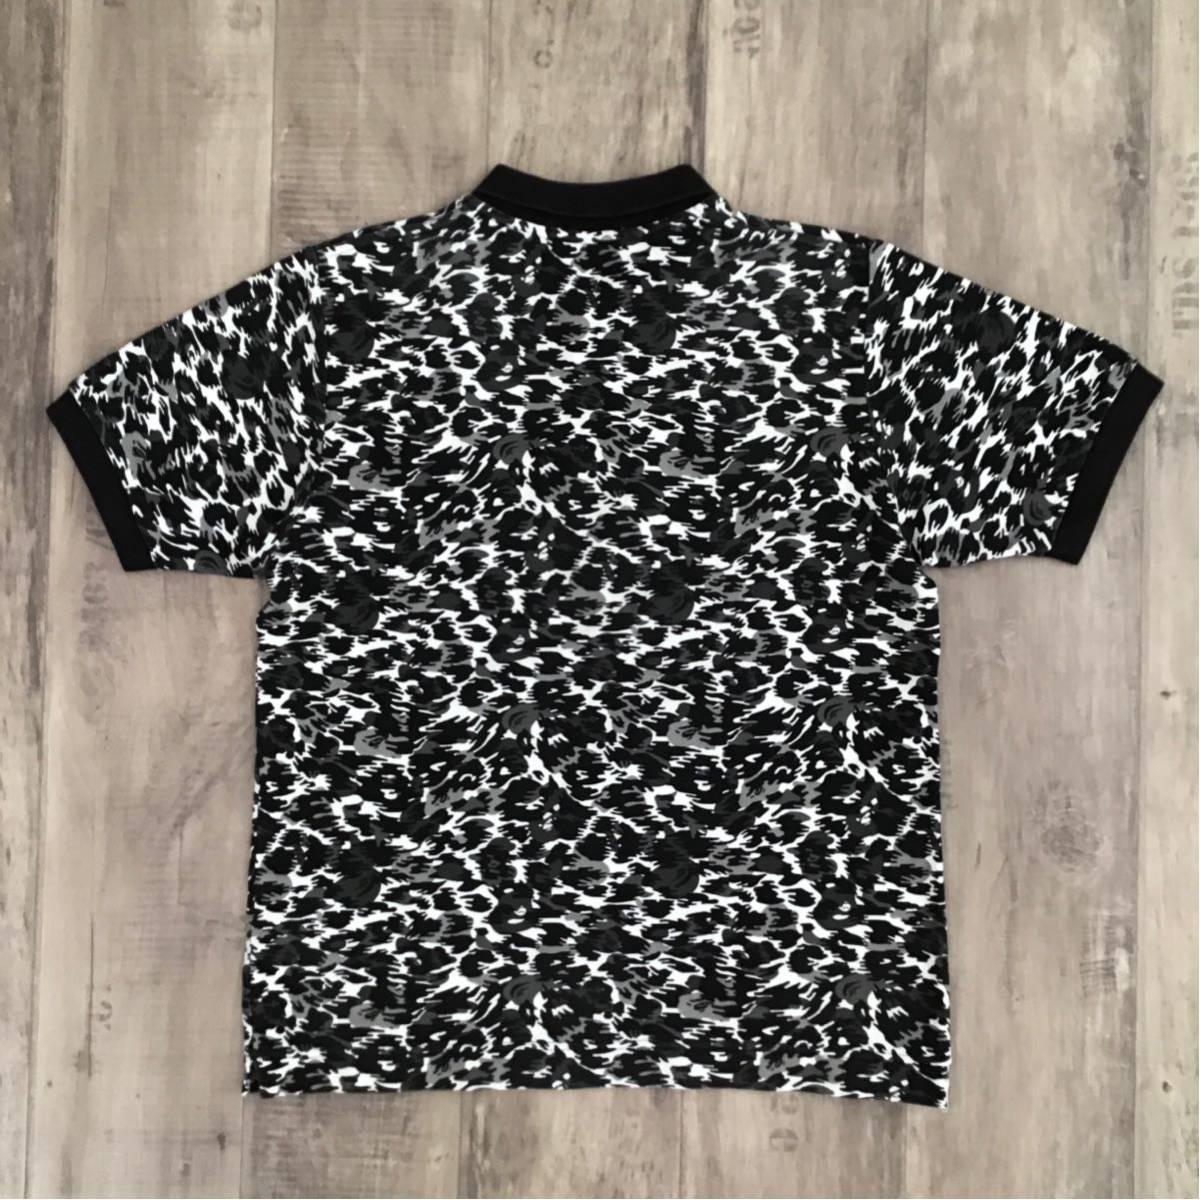 Leopard camo ポロシャツ Sサイズ ブラック a bathing ape bape polo shirt レオパード 迷彩 エイプ ベイプ アベイシングエイプ 豹柄 m83